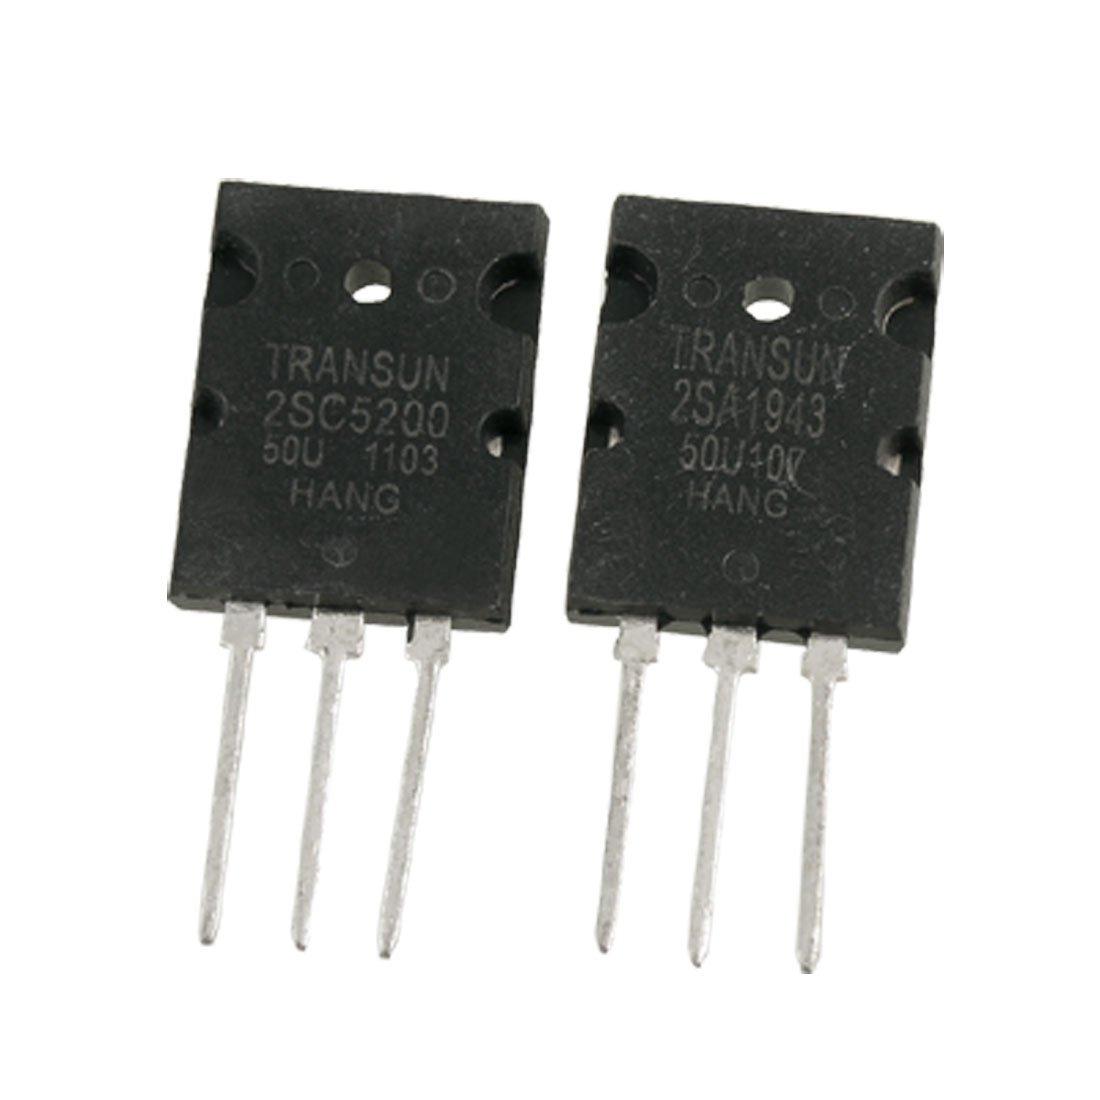 50pcs General Propose 2N2907 25V 0.1A TO-92 Package PNP Transistor SODIAL Transistor R